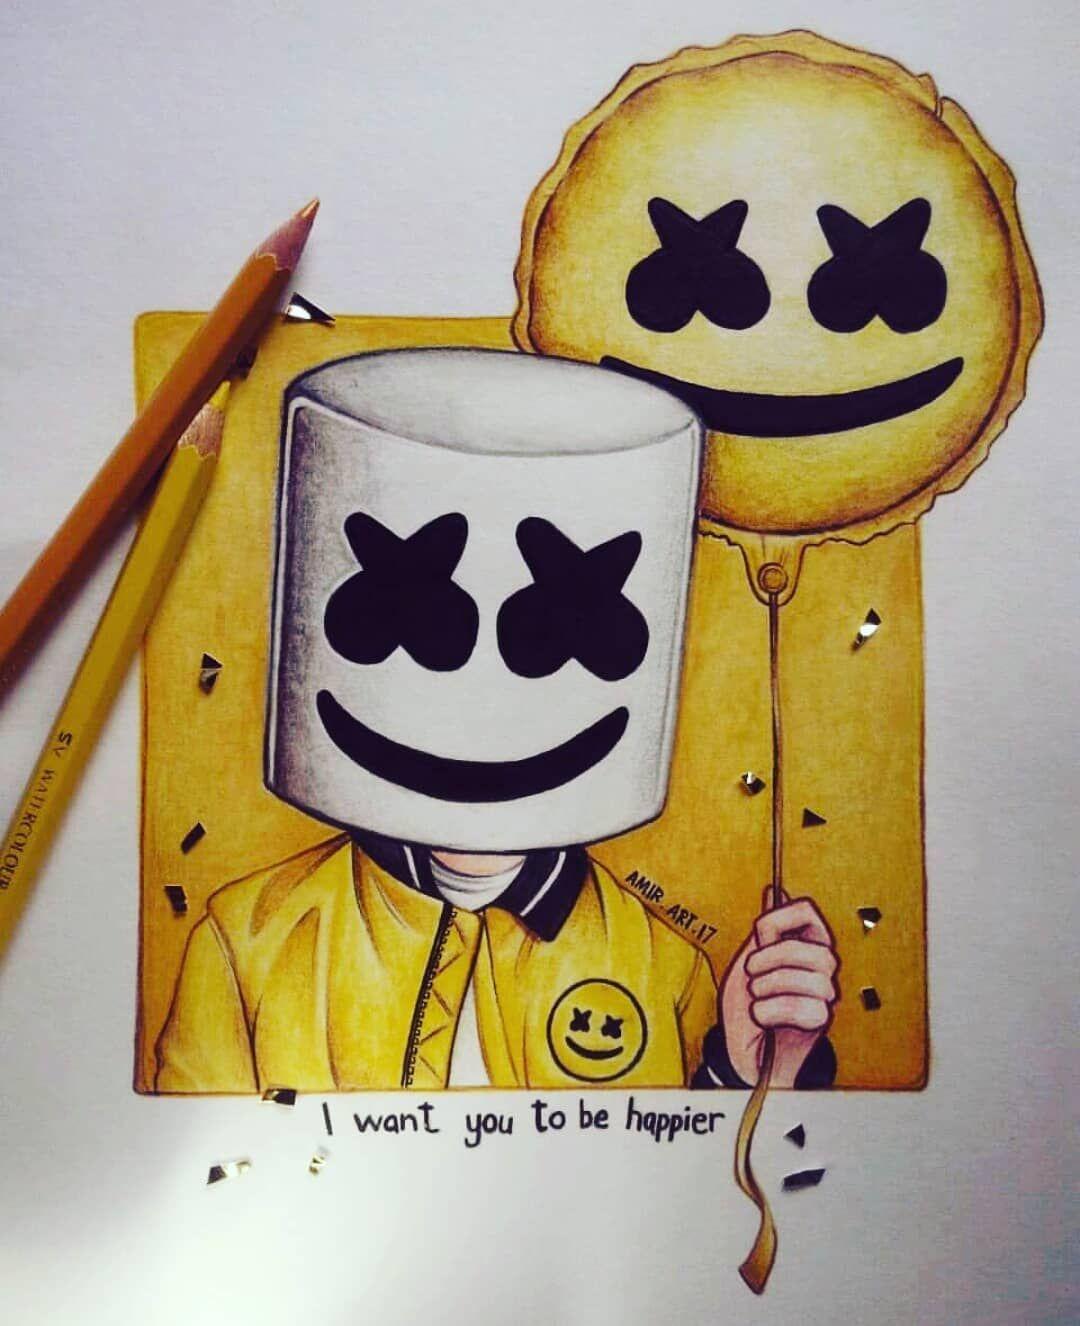 Dj Marshmello Drawing : marshmello, drawing, KEEP_IT_MELLO, @marshmellomusic, #marshmellomusic, #marshmello, #mellogang, #mello, #marshmallow, #marshmellofamily, Drawings, Love,, Drawings,